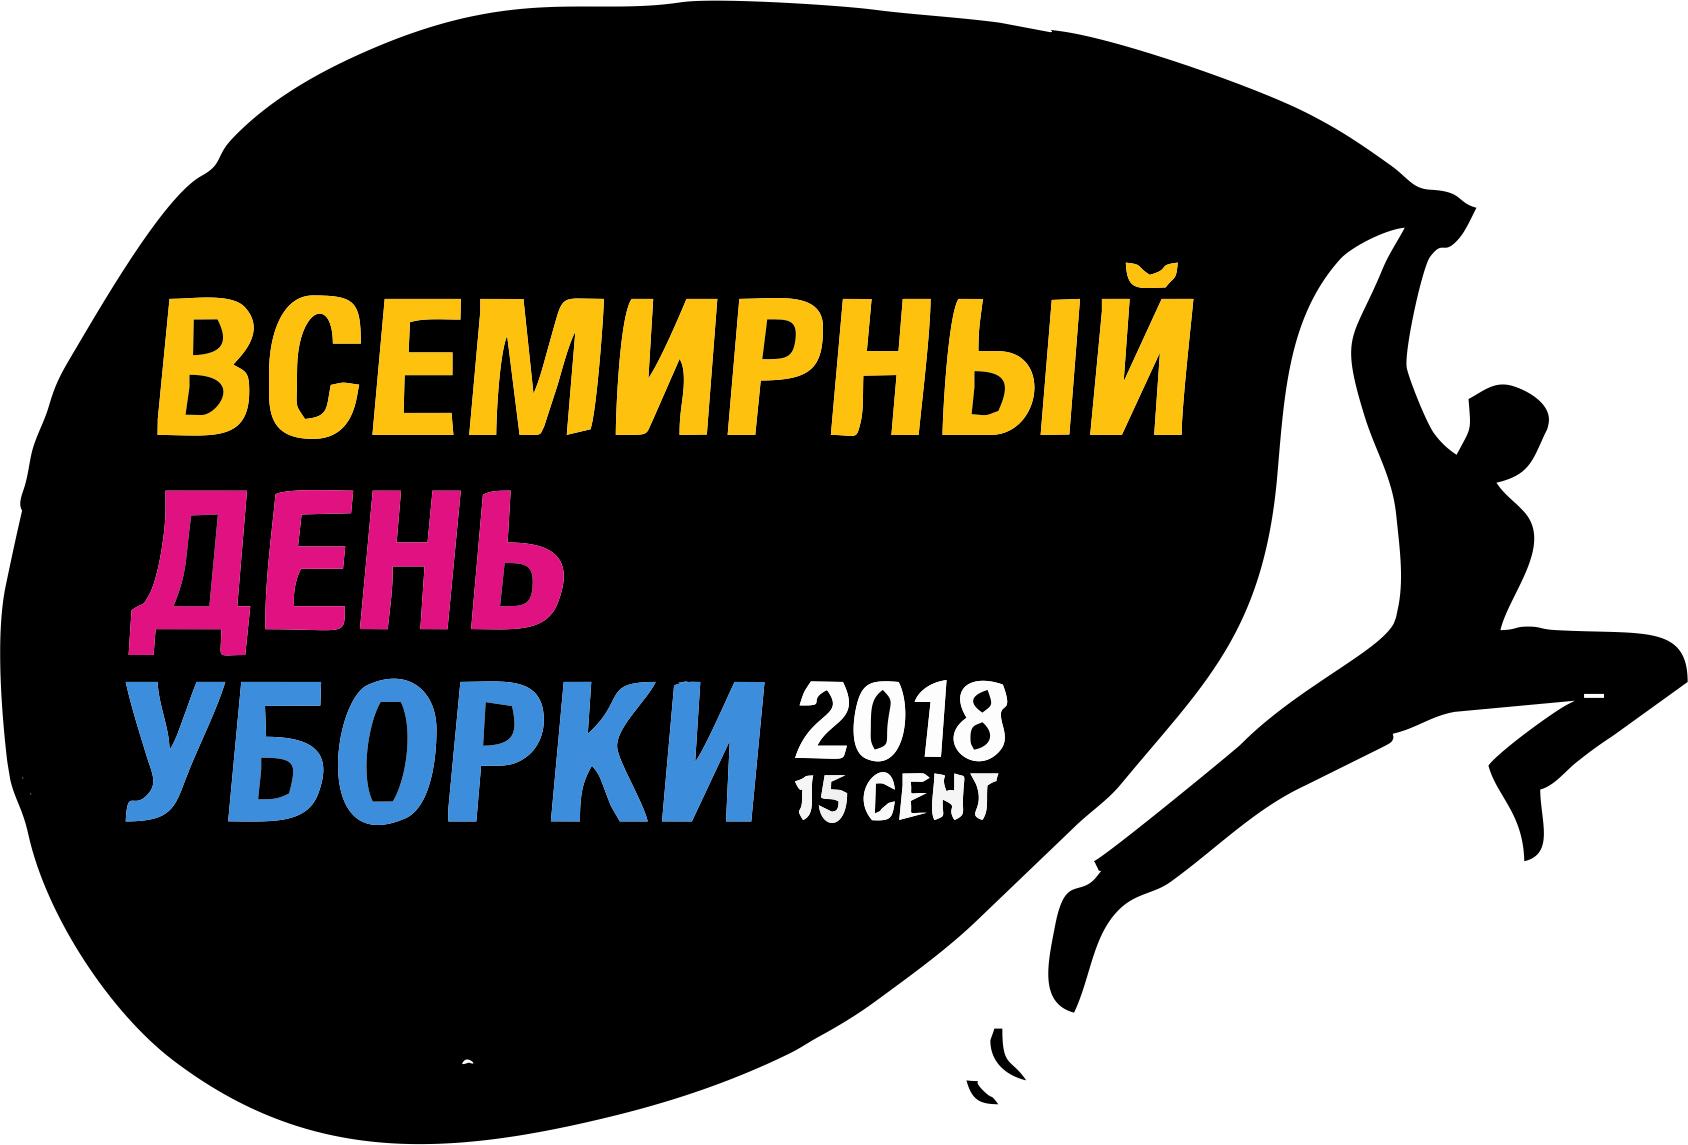 Hai Moldova приглашает жителей Кишинёва на уборку 31 марта